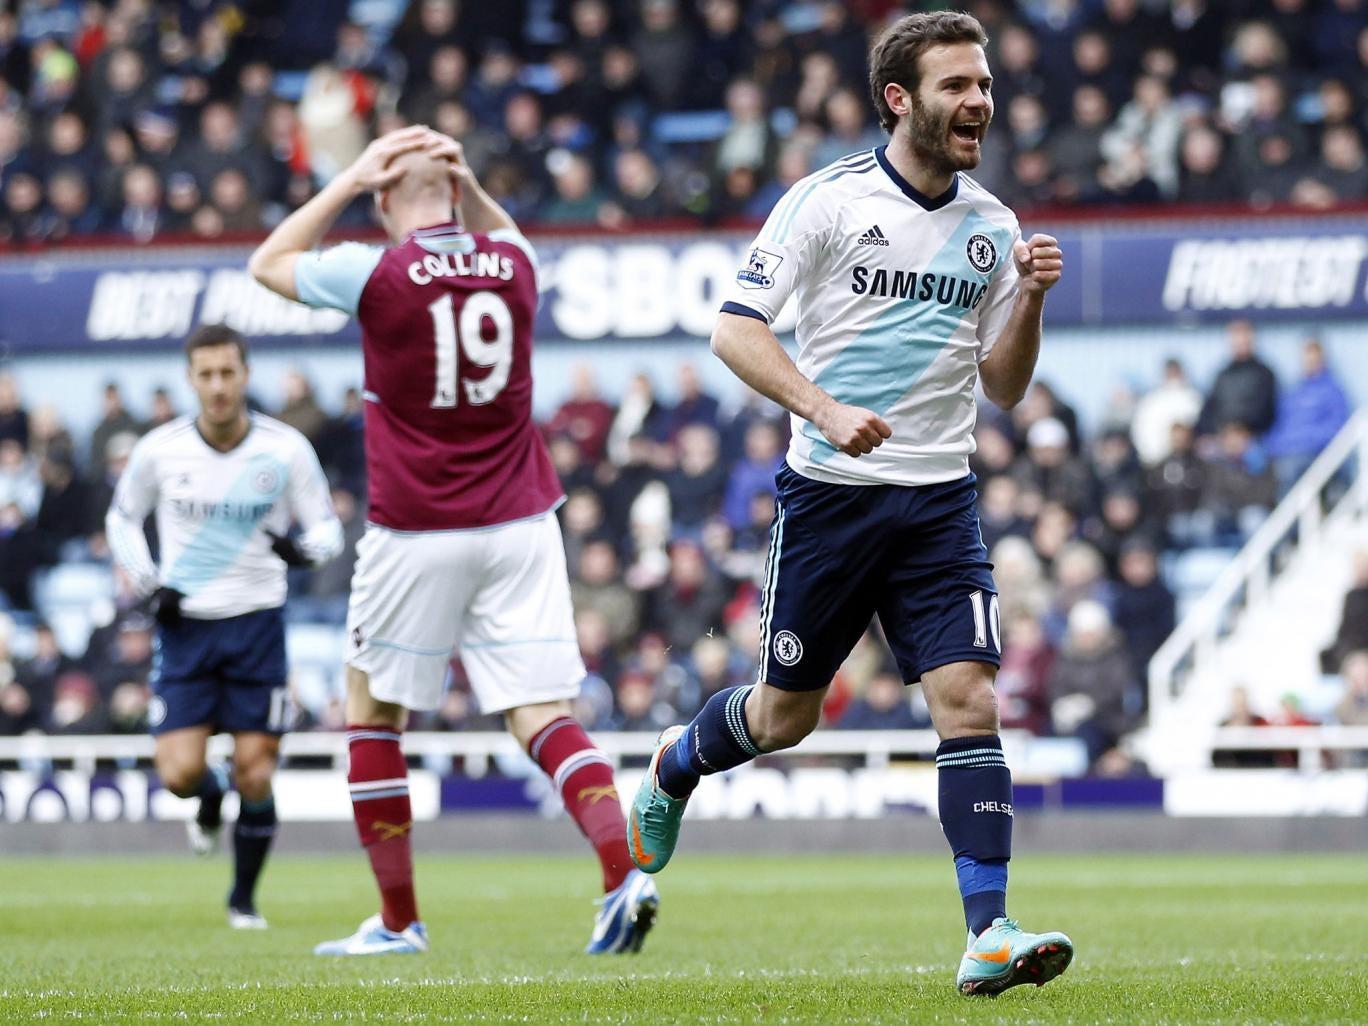 Juan Mata of Chelsea celebrates his goal, much to James Collins of West Ham's despair